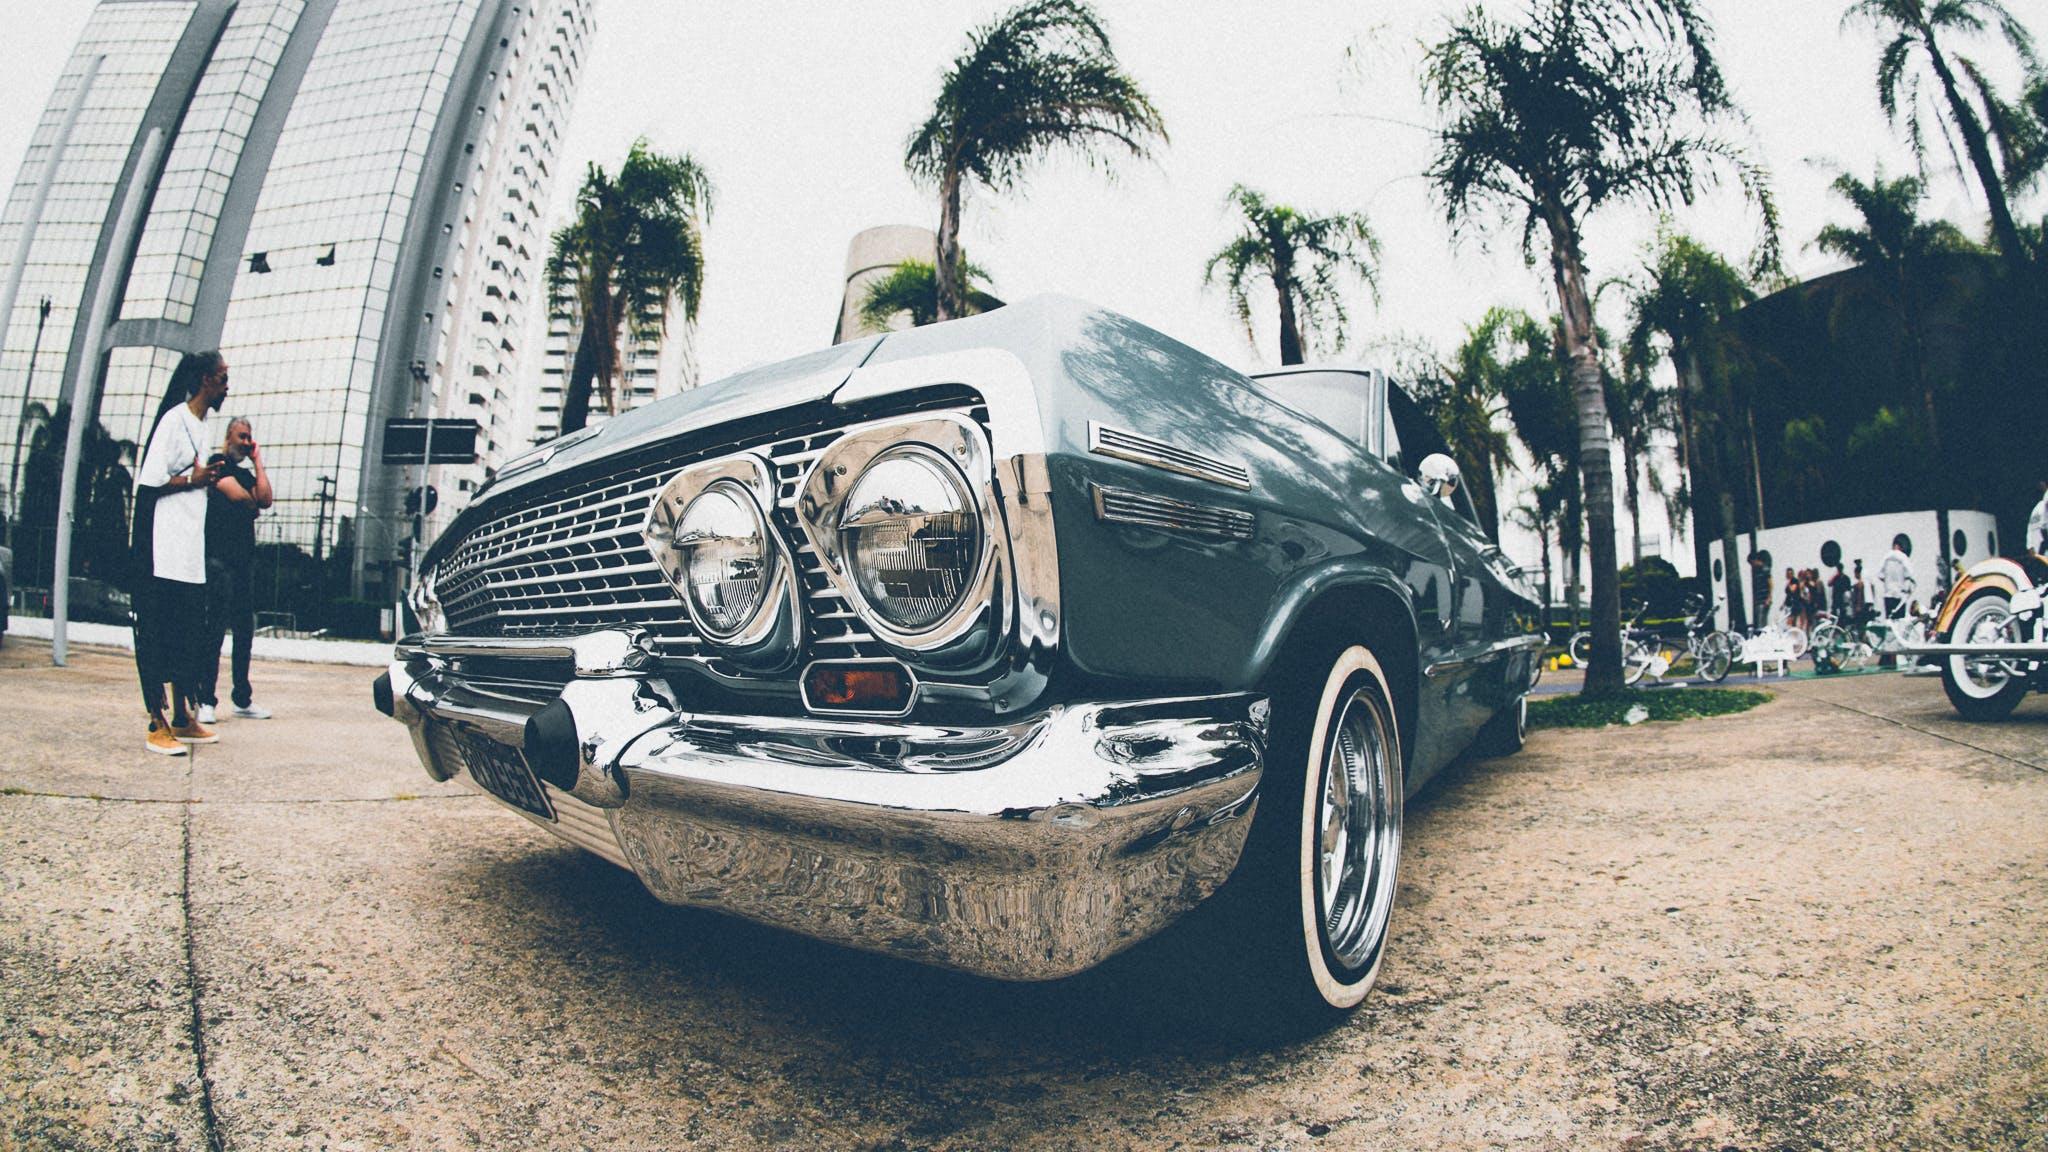 Classic Blue Chevrolet Impala Parked Beside Man